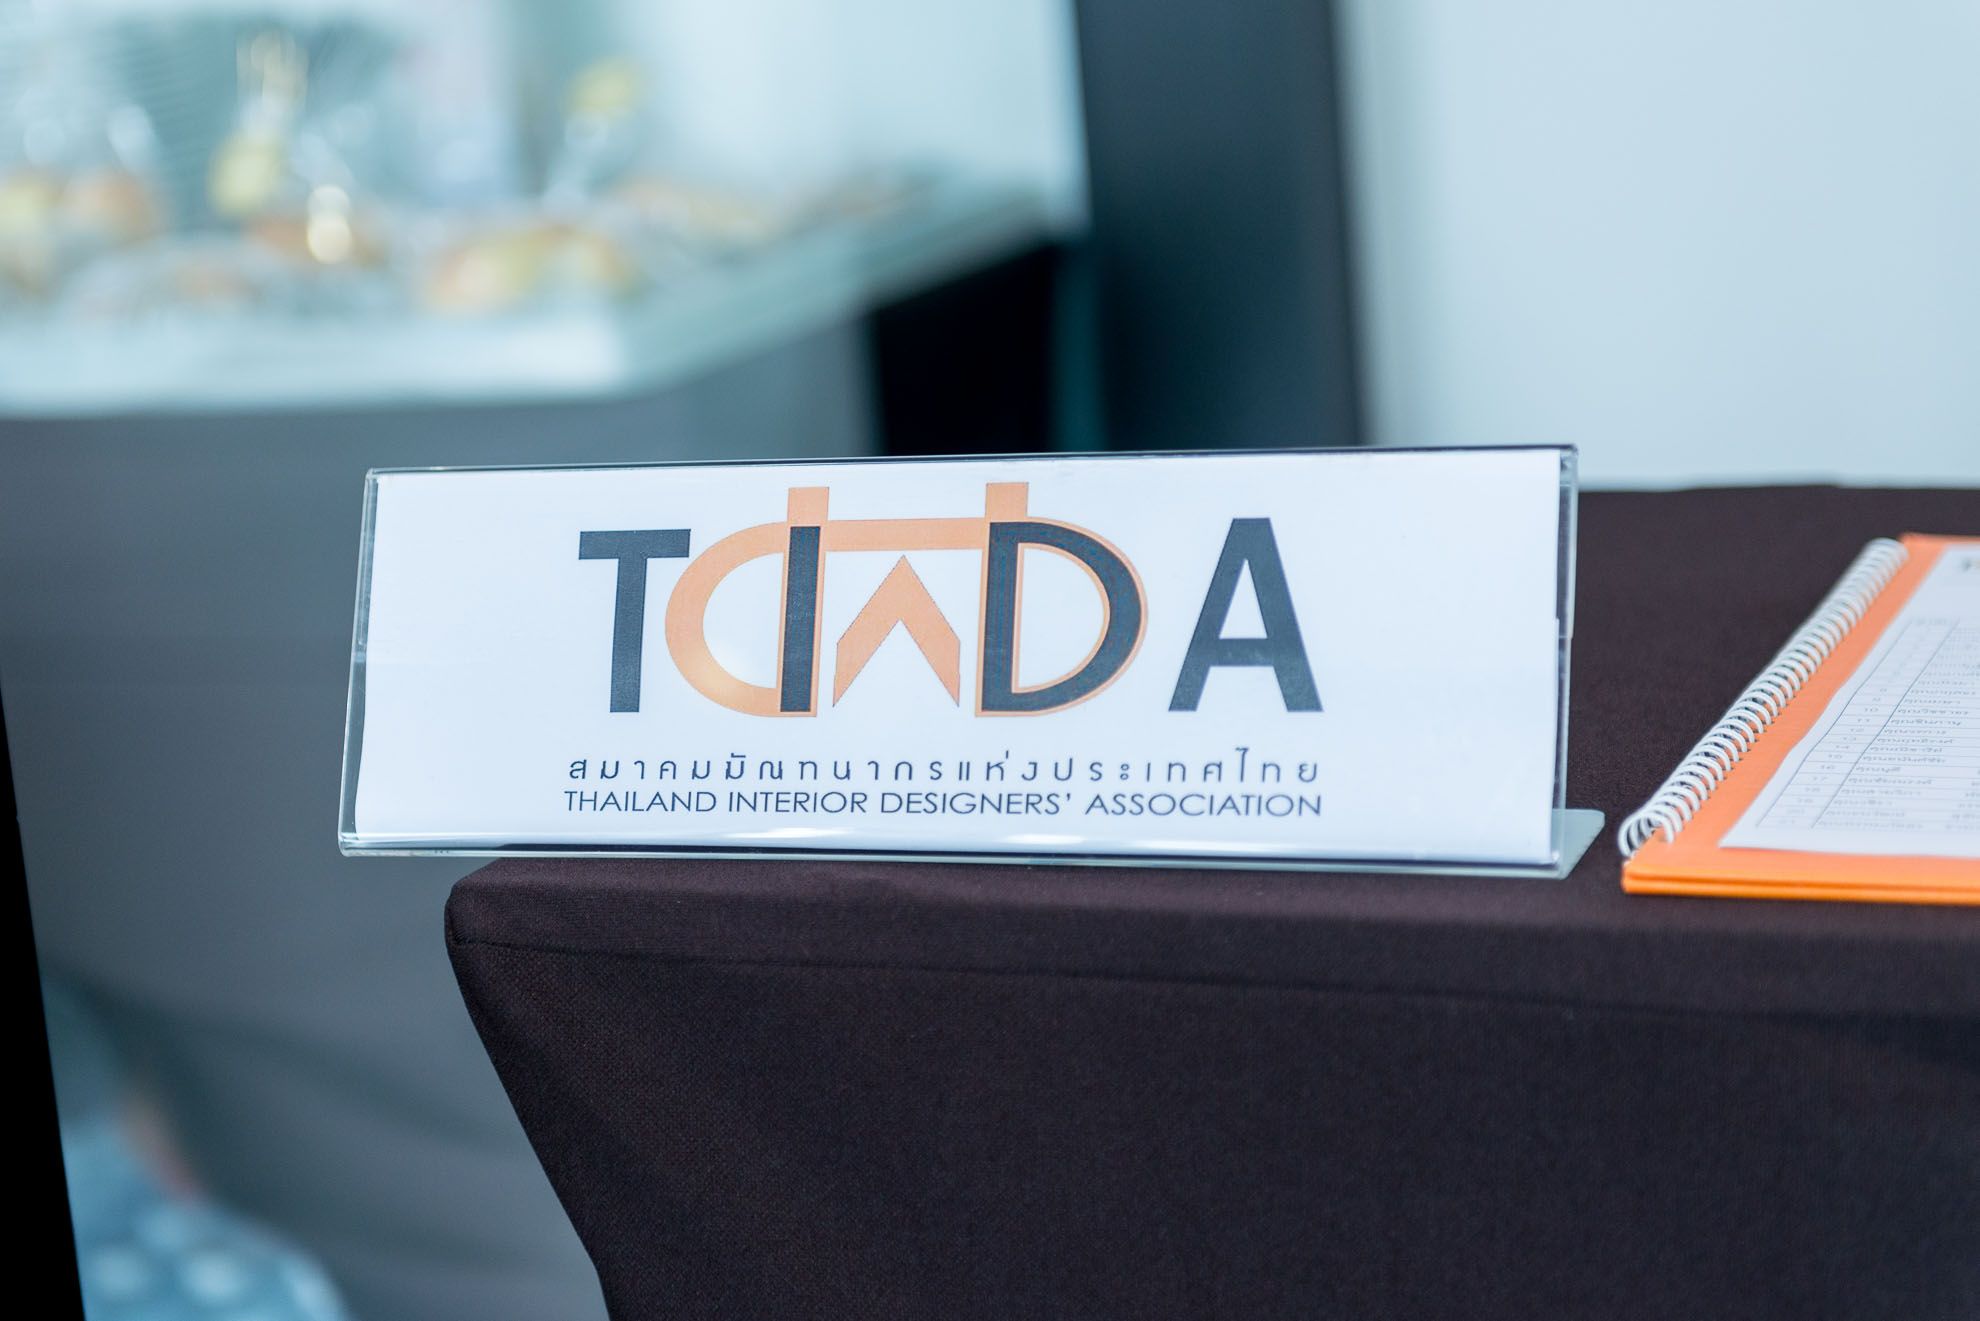 TIDA Thesis Awards 2018 (รอบตัดสิน : นำเสนอผลงานผู้เข้ารอบสุดท้าย)